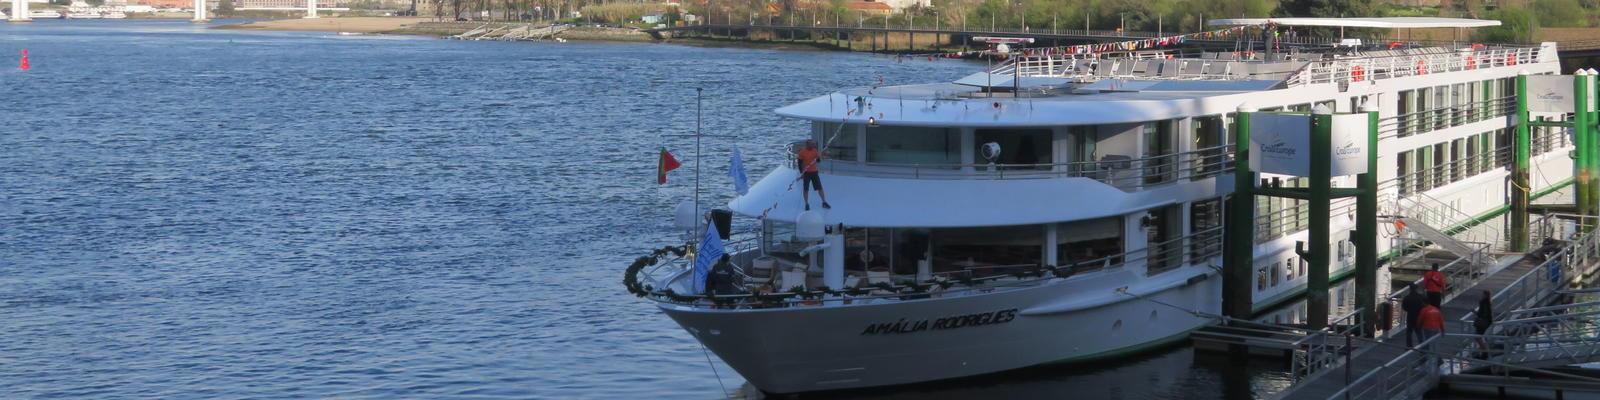 CroisiEurope Christens Amalia Rodrigues River Cruise Ship on the Douro